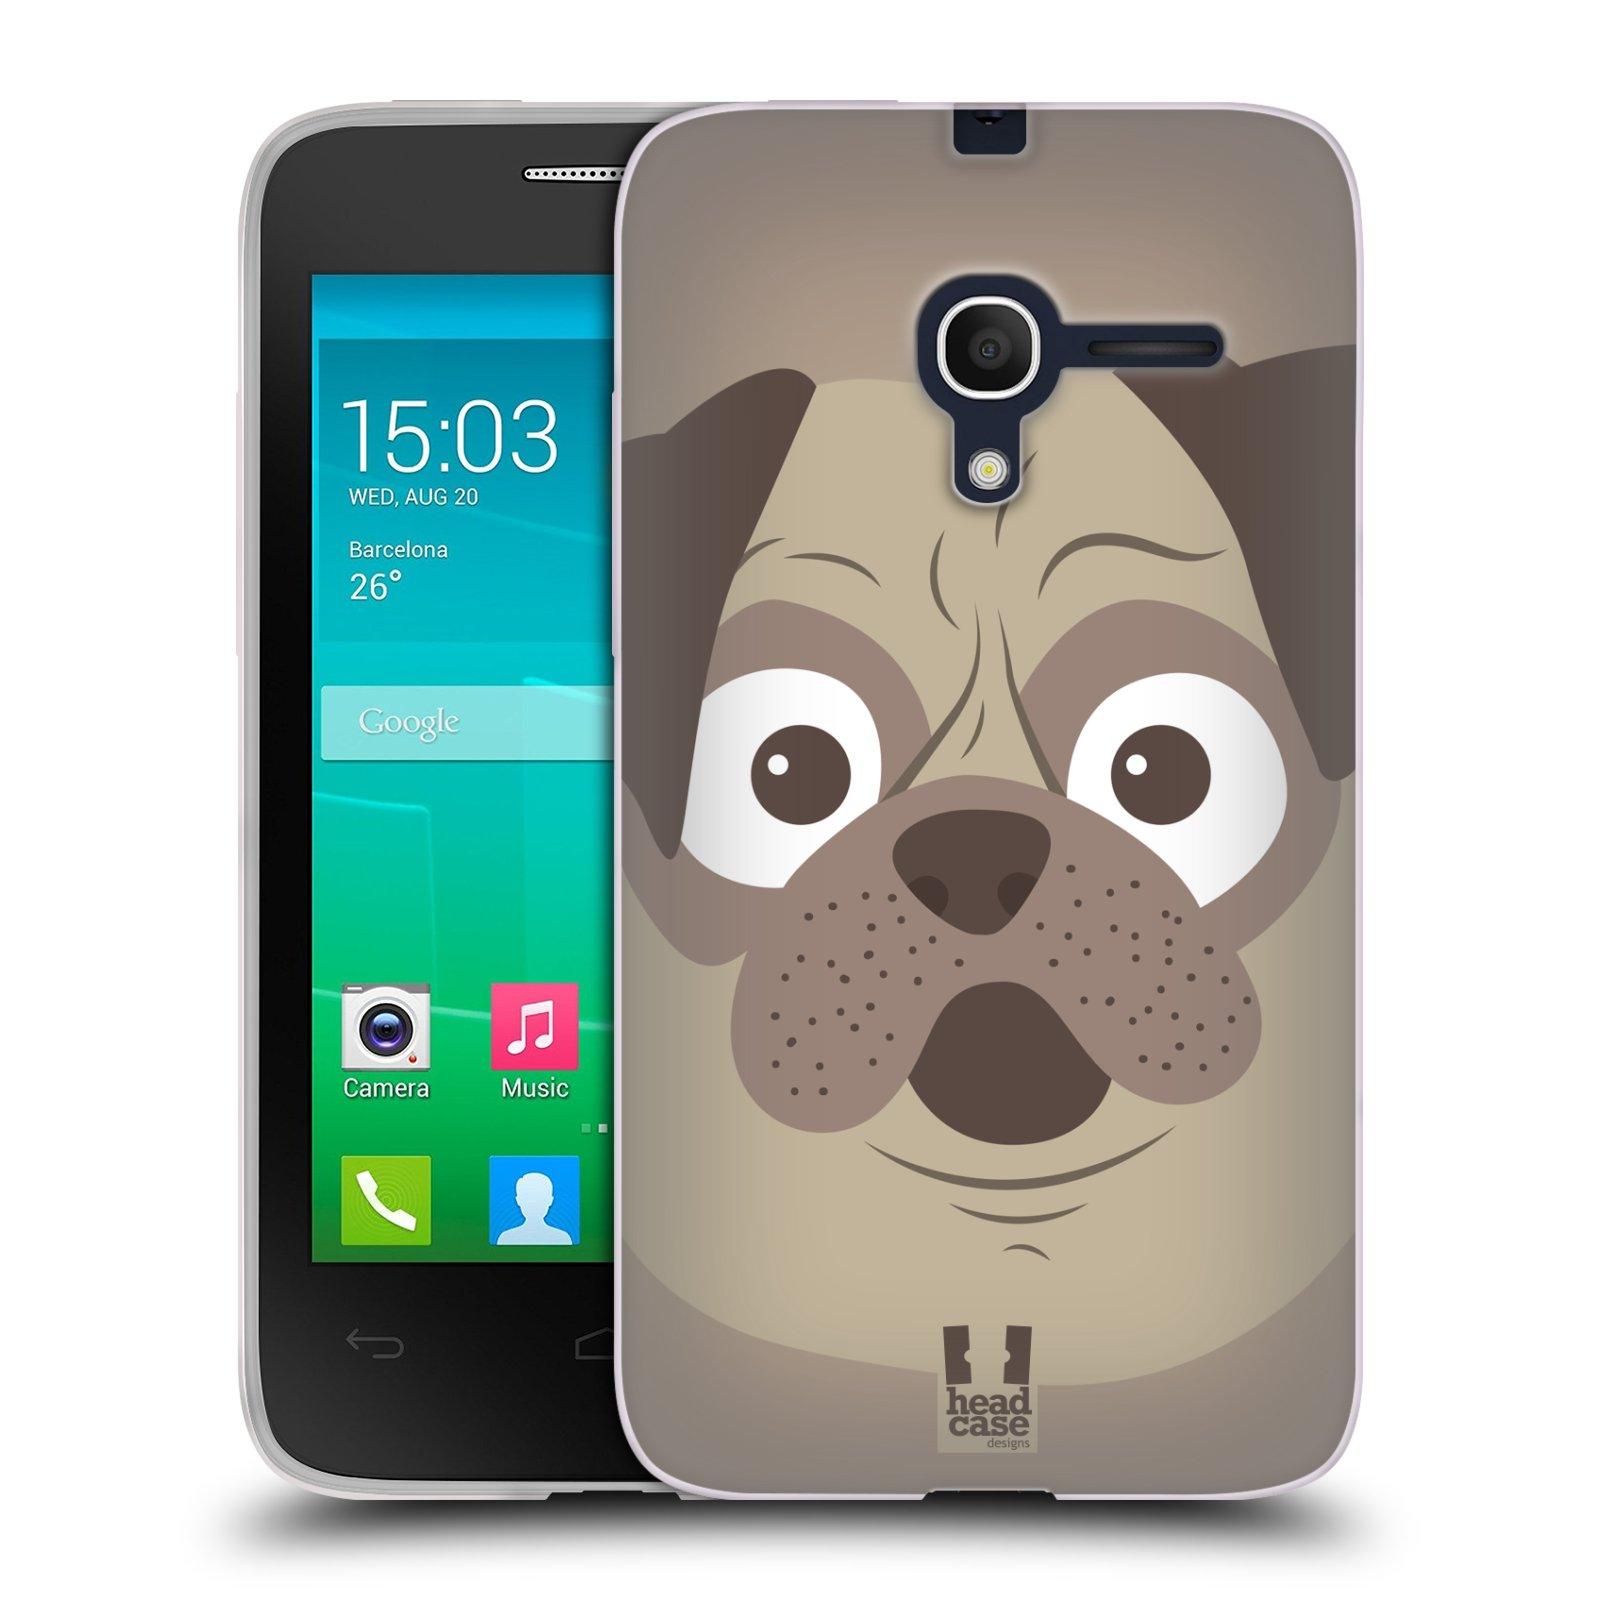 HEAD CASE silikonový obal na mobil Alcatel POP D3 OT-4035D vzor Cartoon Karikatura barevná kreslená zvířátka pes mopsík